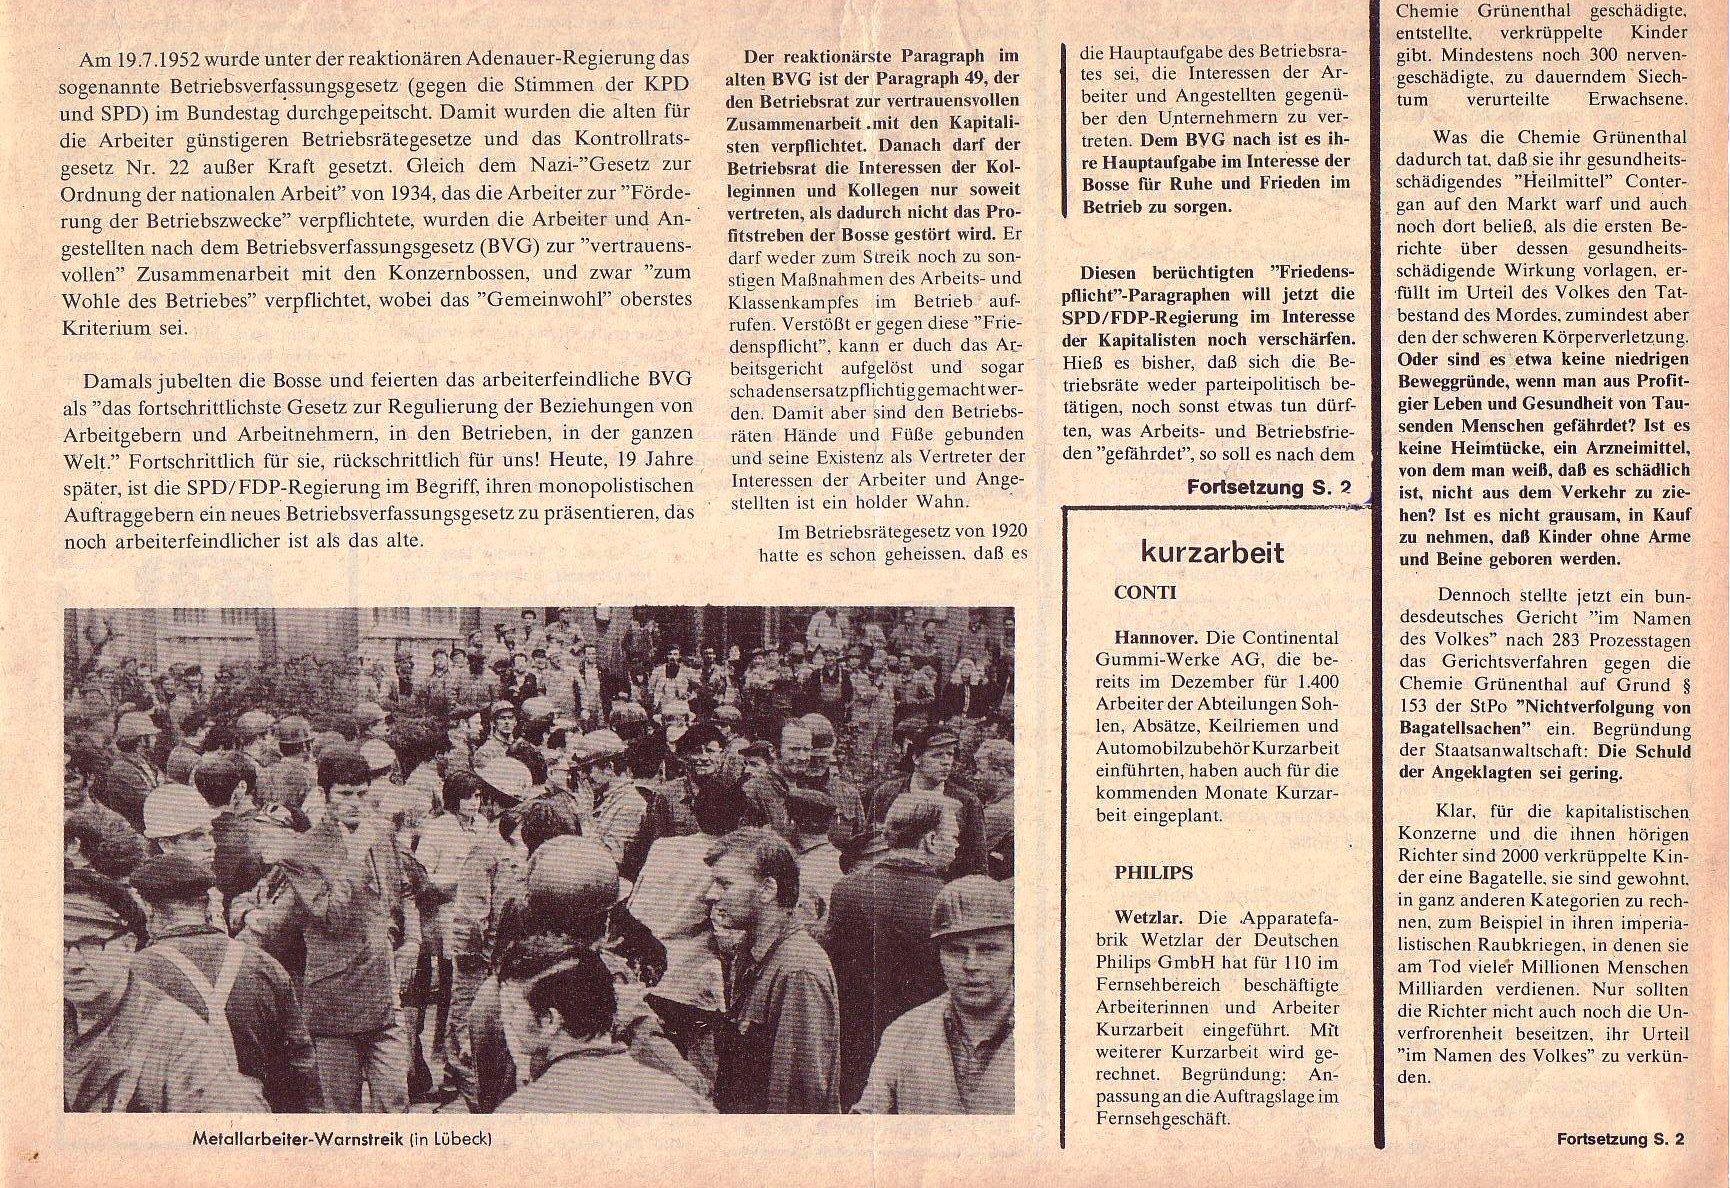 Roter Morgen, 5. Jg., Februar 1971, Nr. 2, Seite 1b